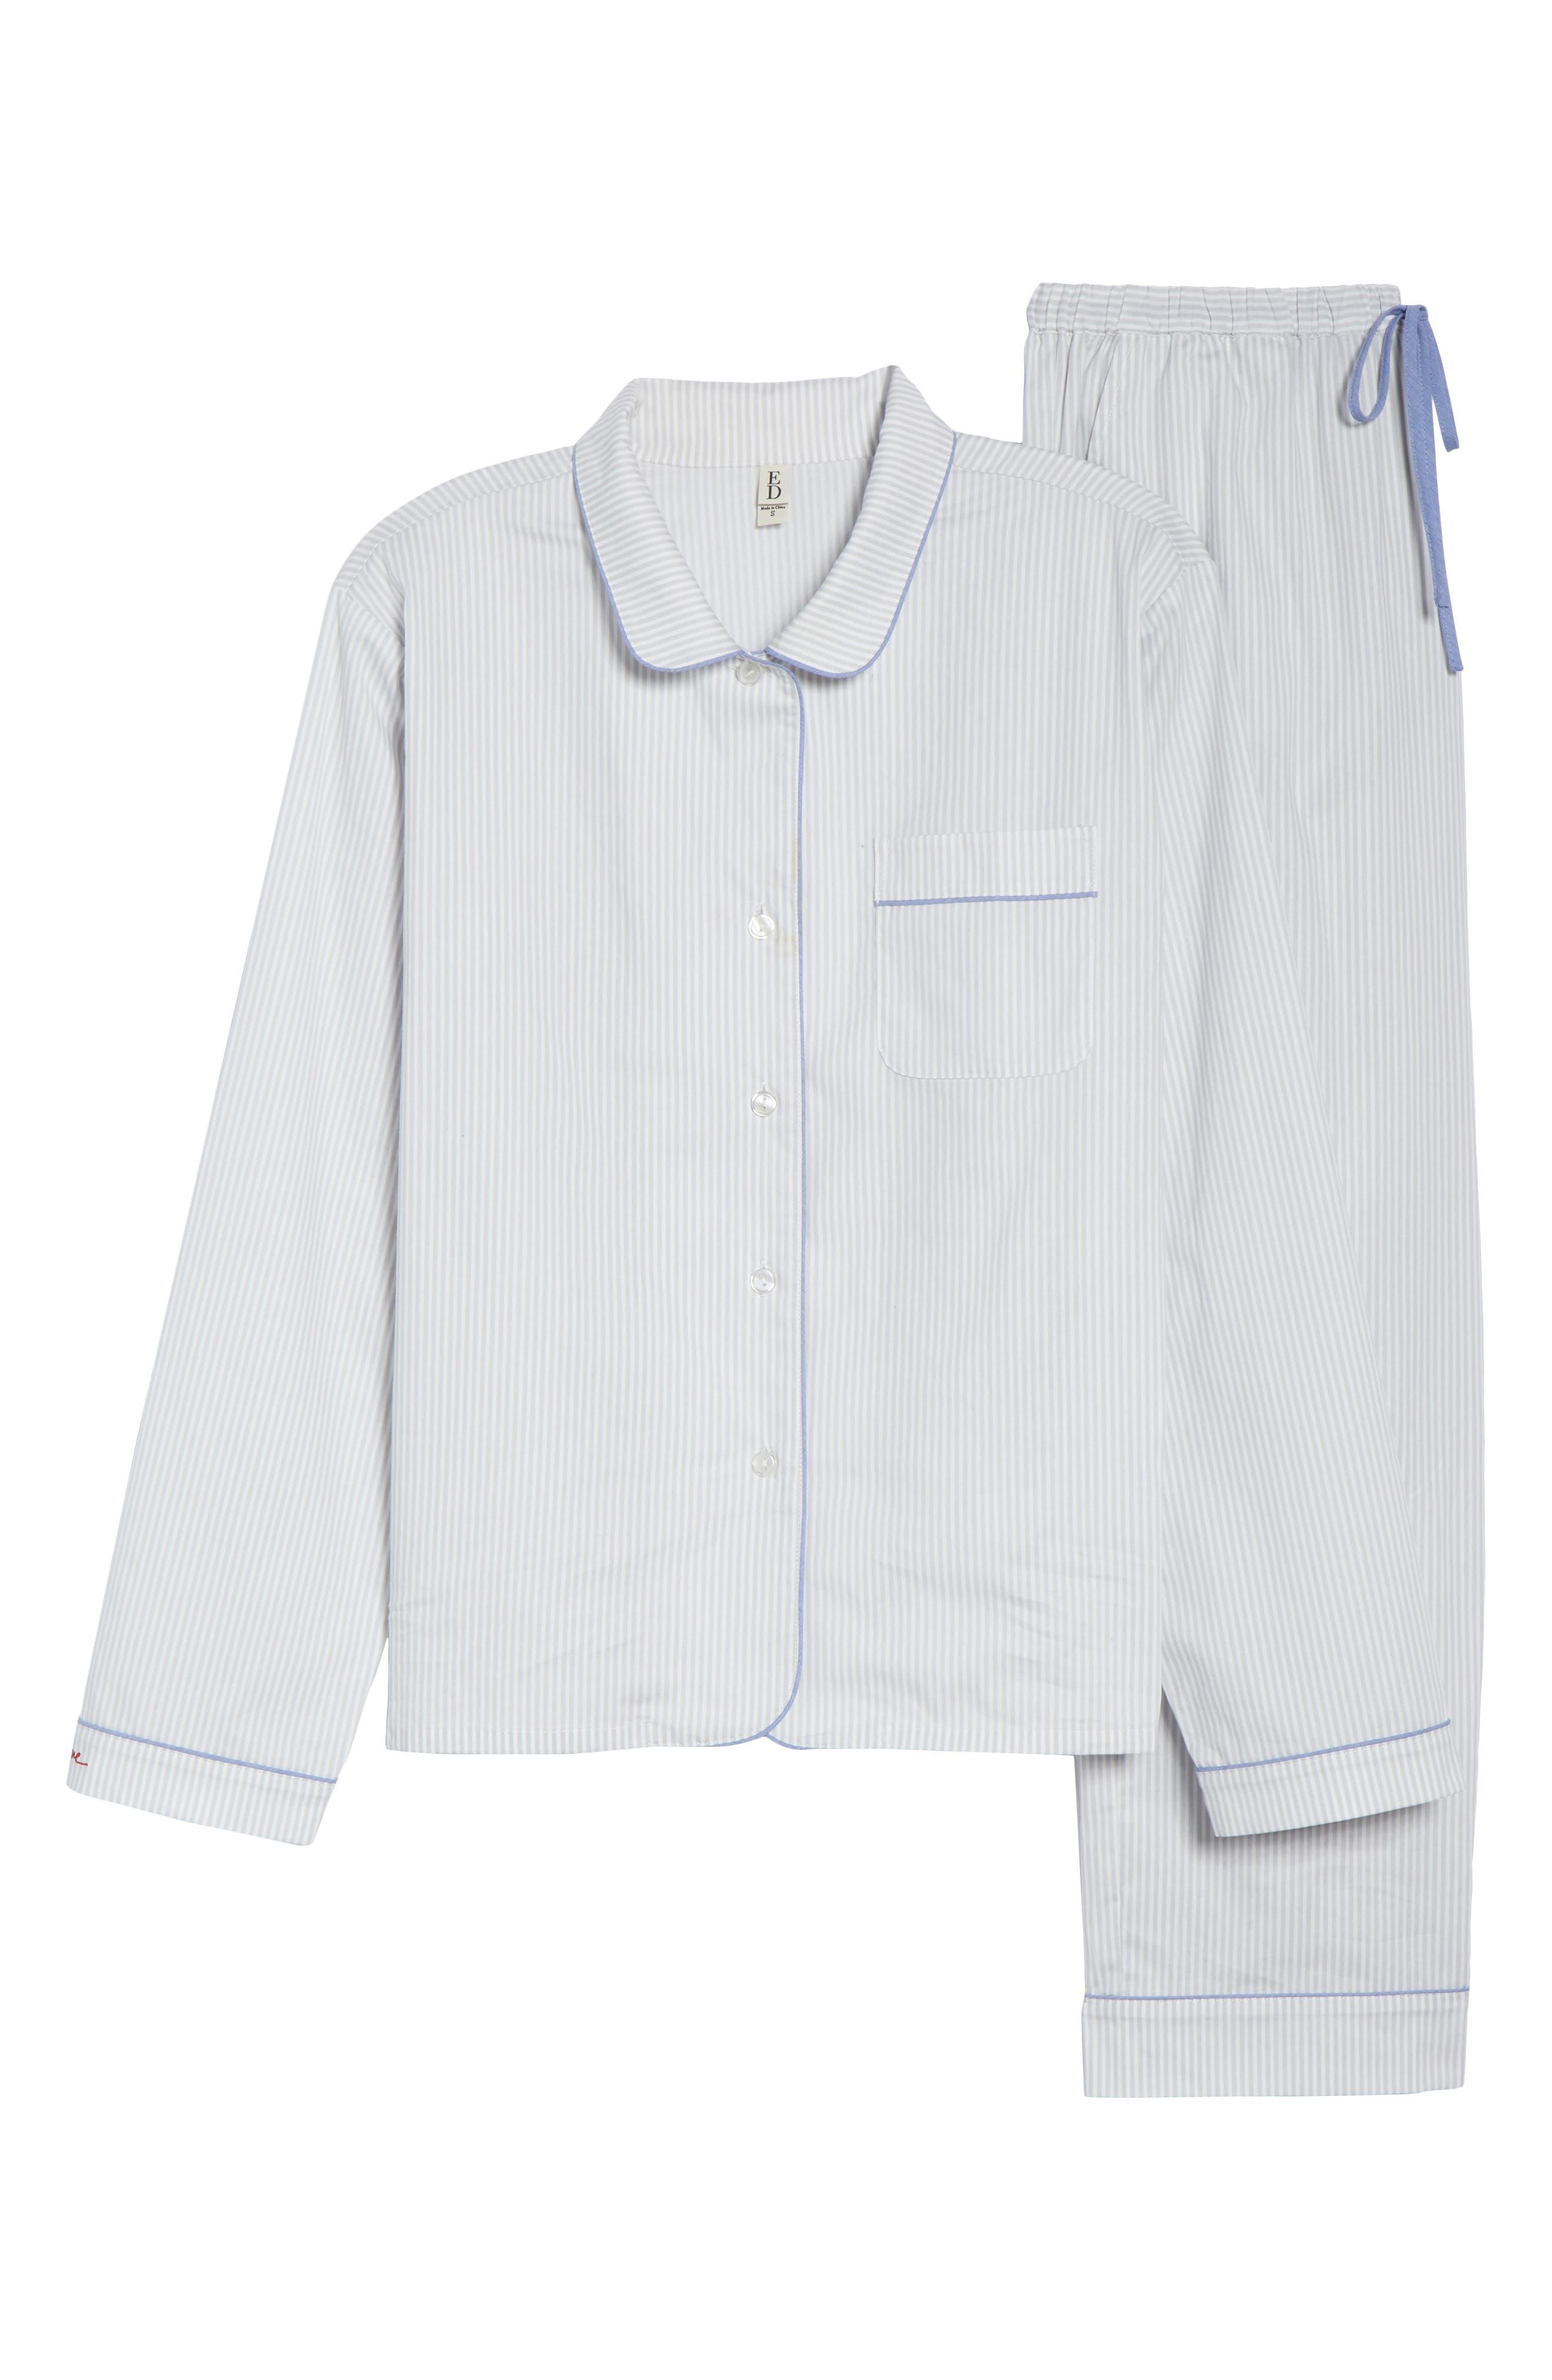 ED ELLEN DEGENERES,                             Signature Woven Pajamas,                             Alternate thumbnail 6, color,                             GREY